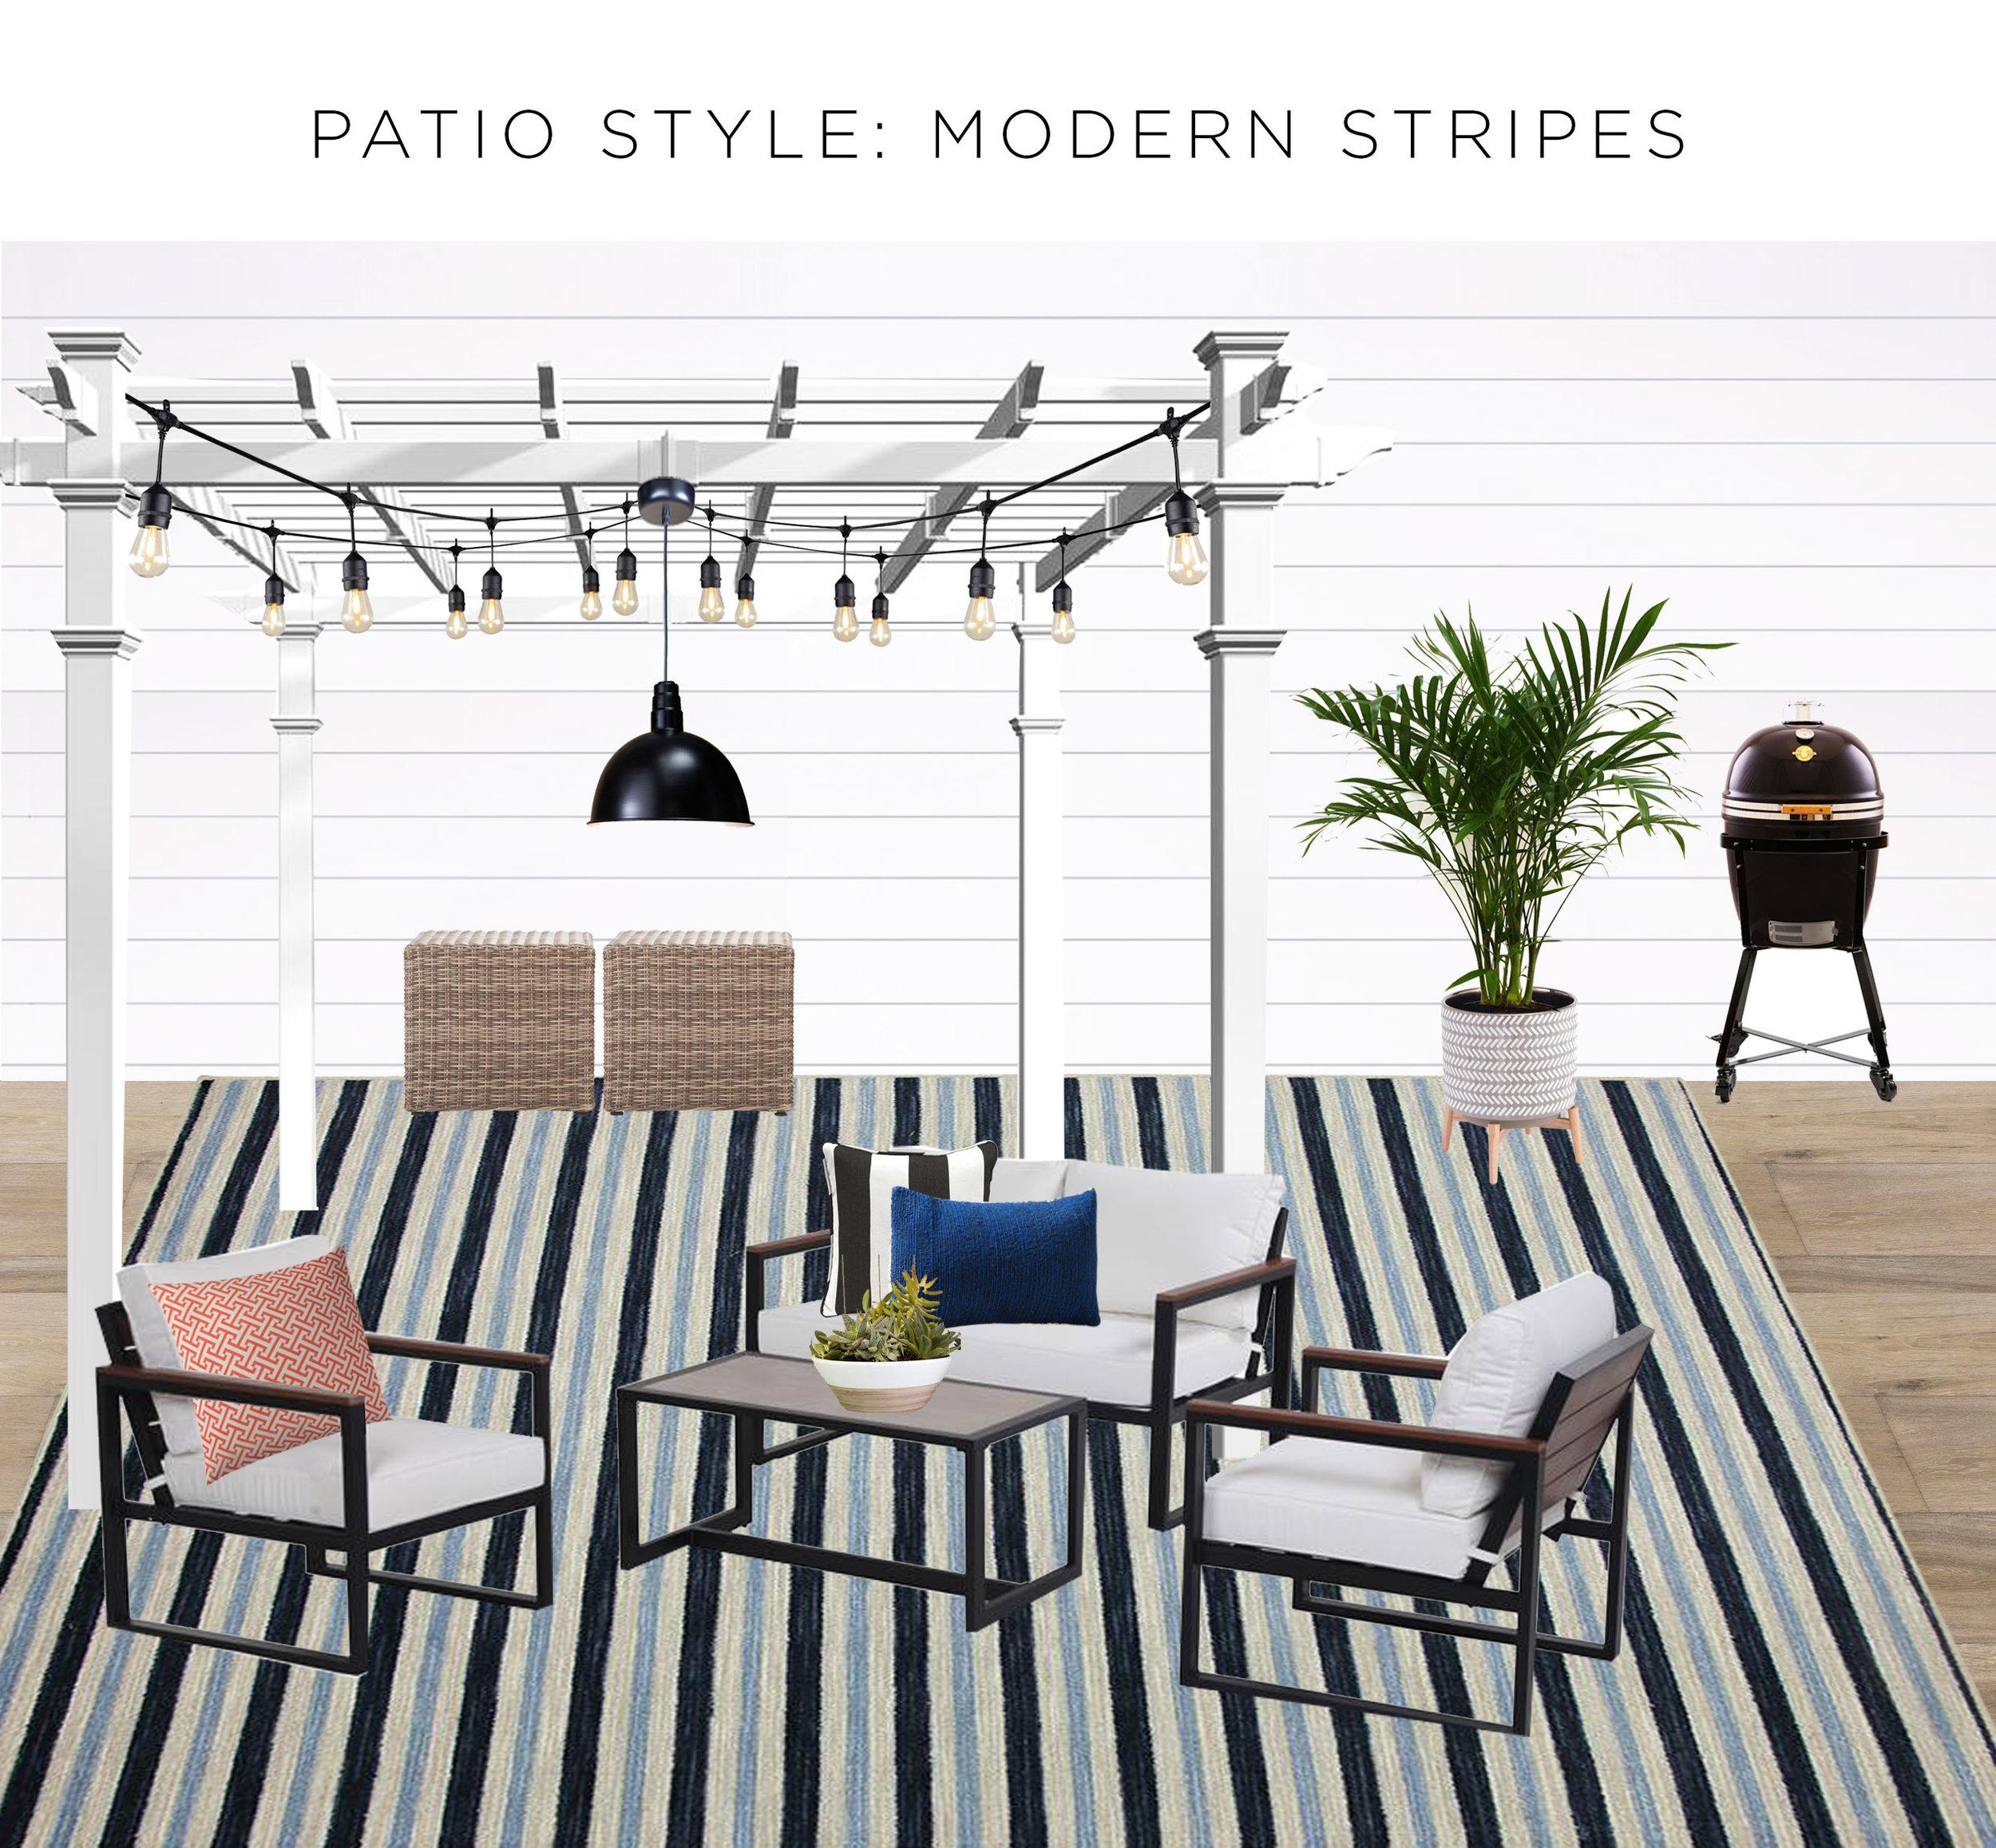 hd-patio-design-mod-stripes.jpg